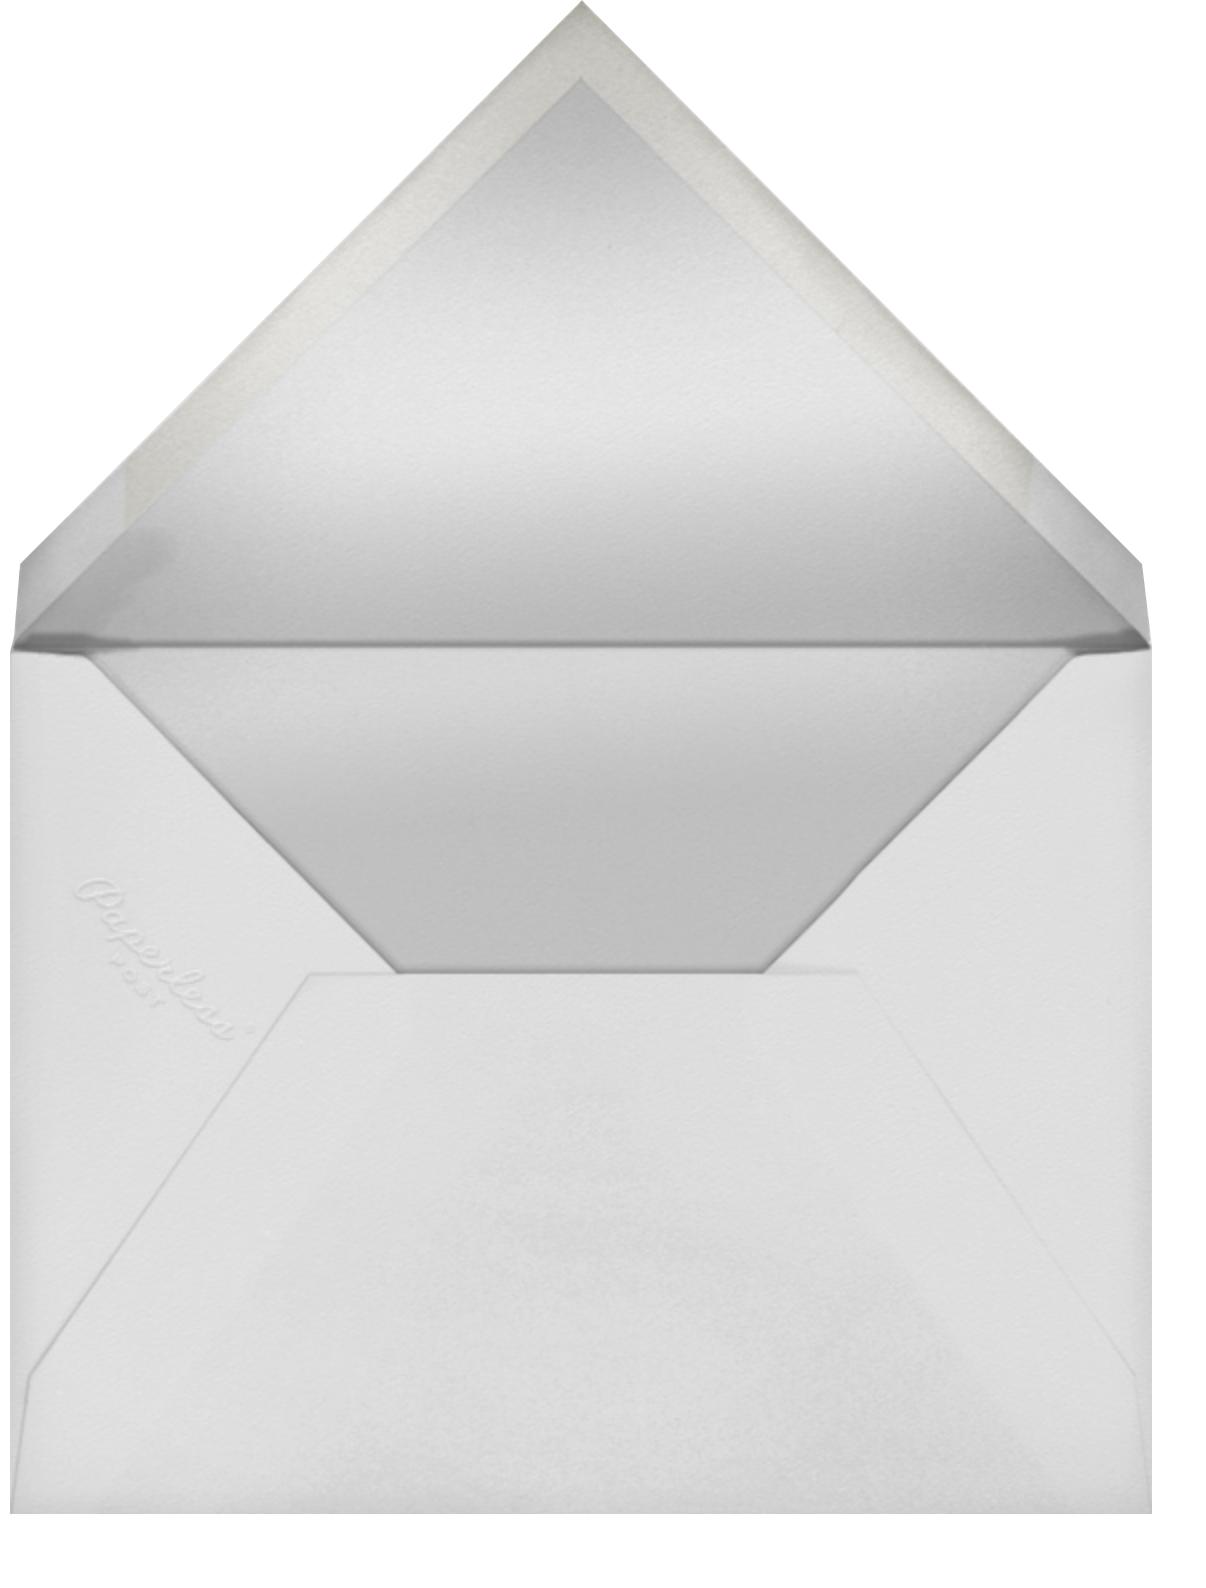 Crete Navy Vertical - Paperless Post - Envelope